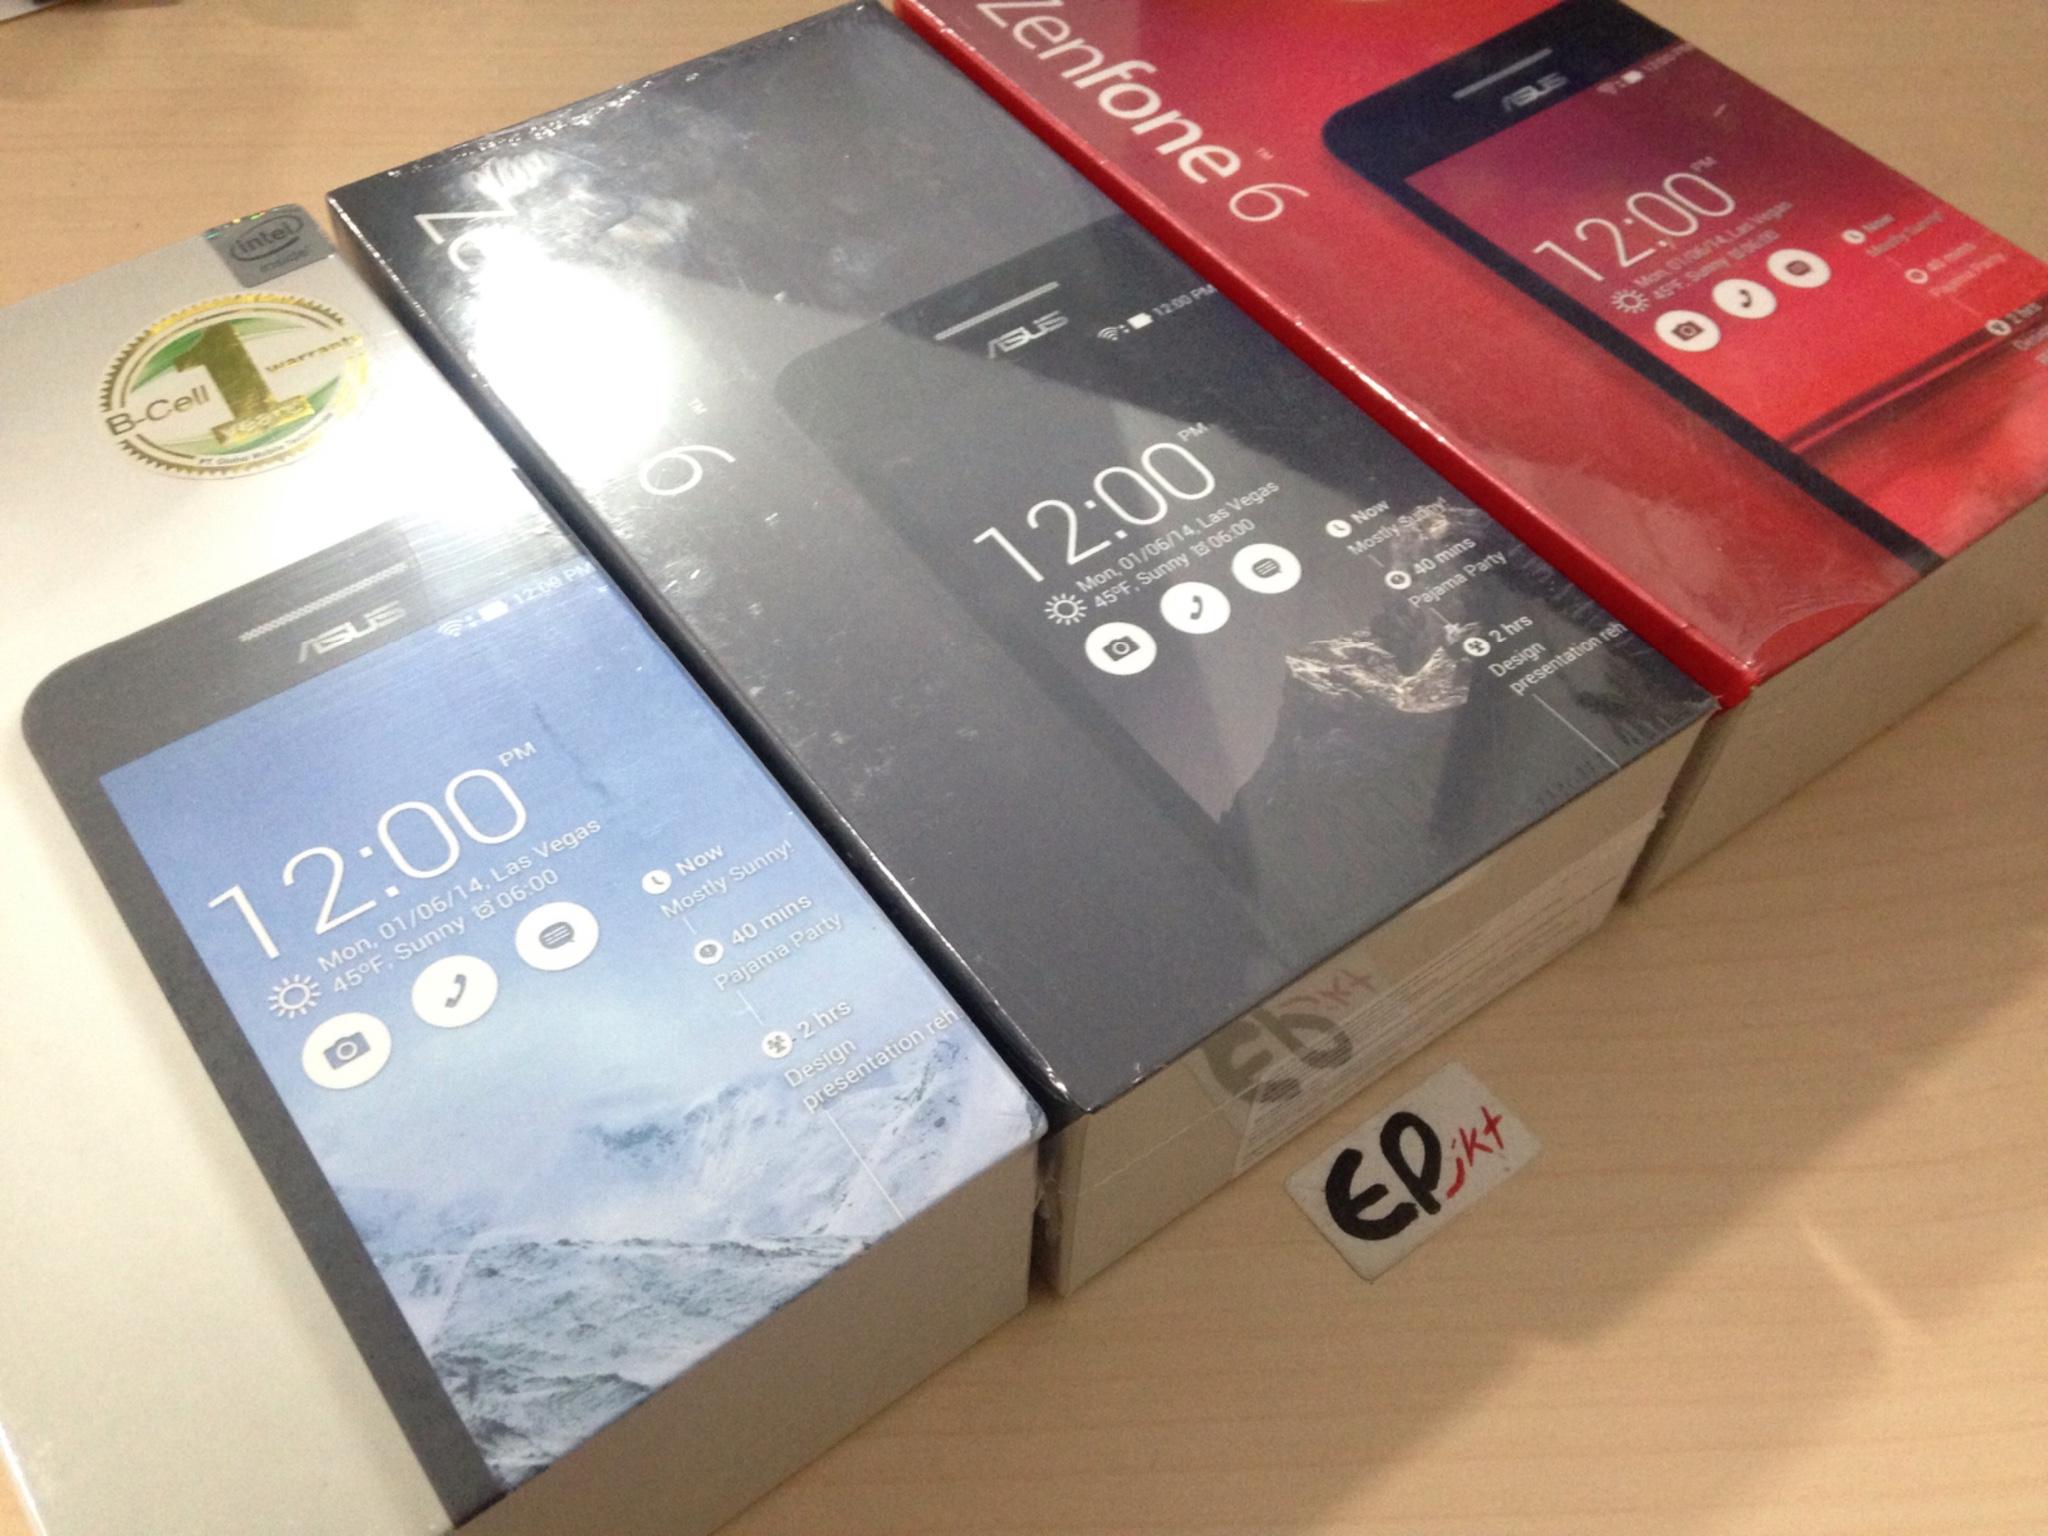 Jual ASUS ZENFONE 6 RAM 2GB ROM 16GB